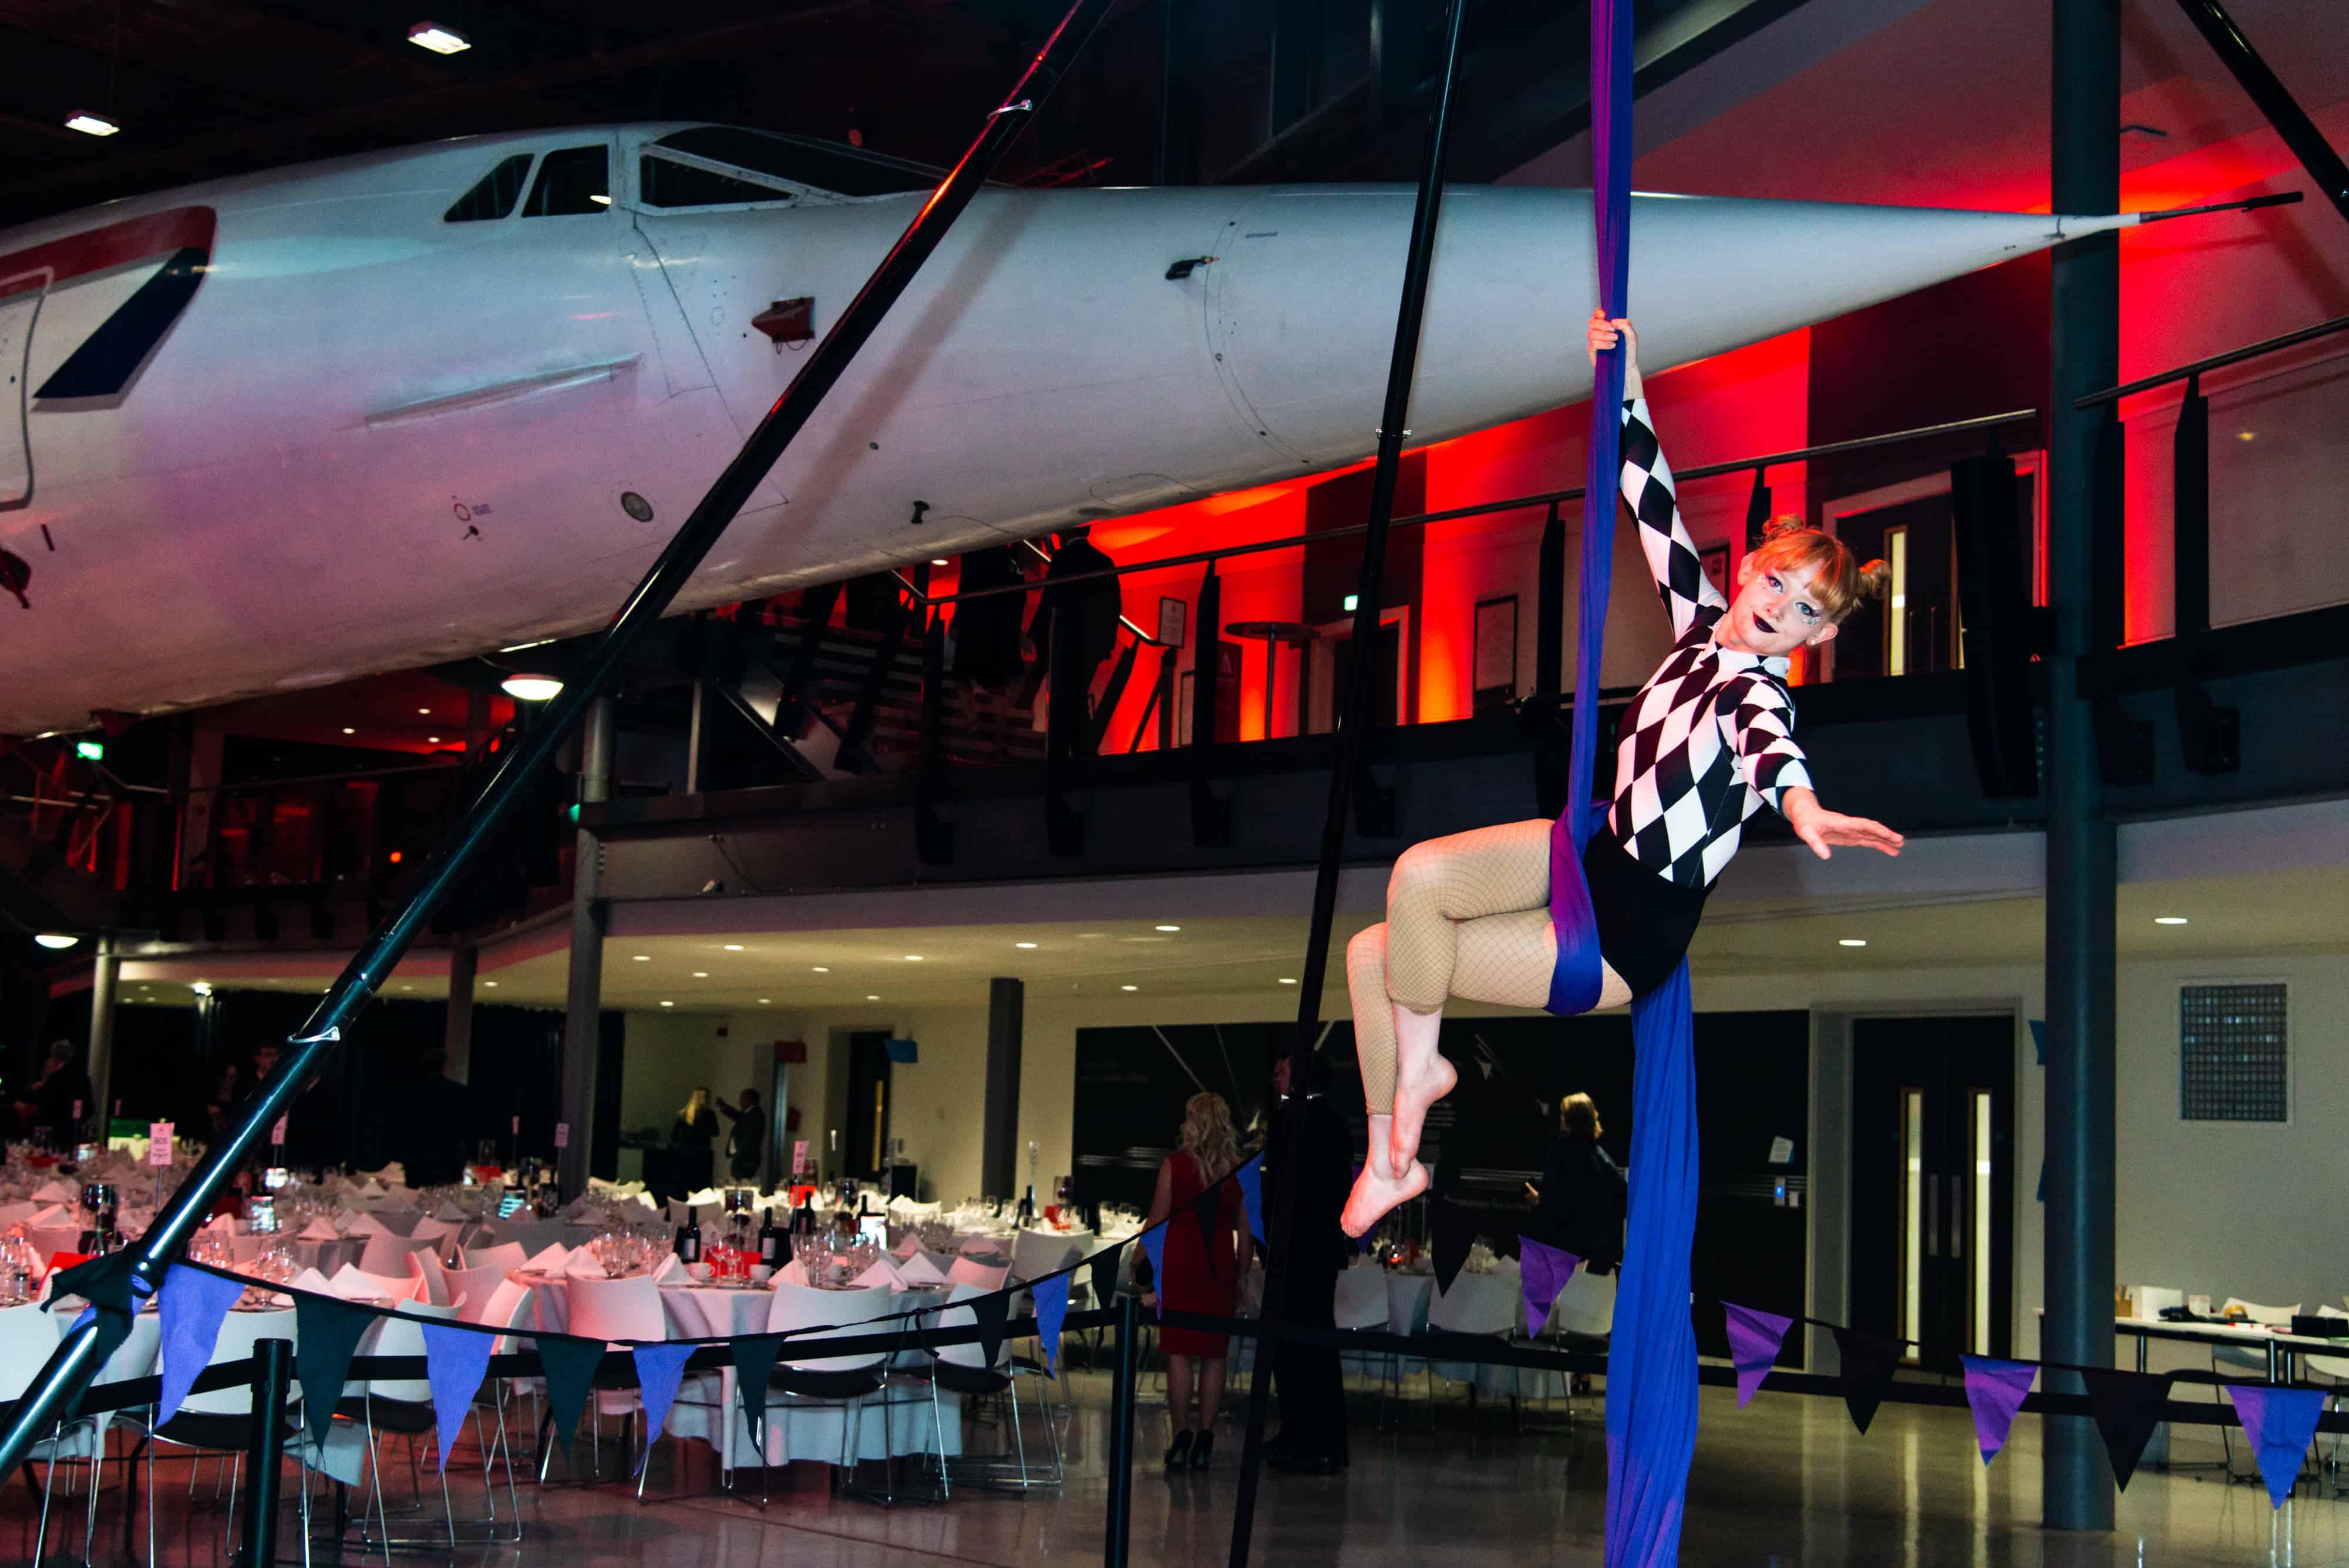 Parties at Aerospace